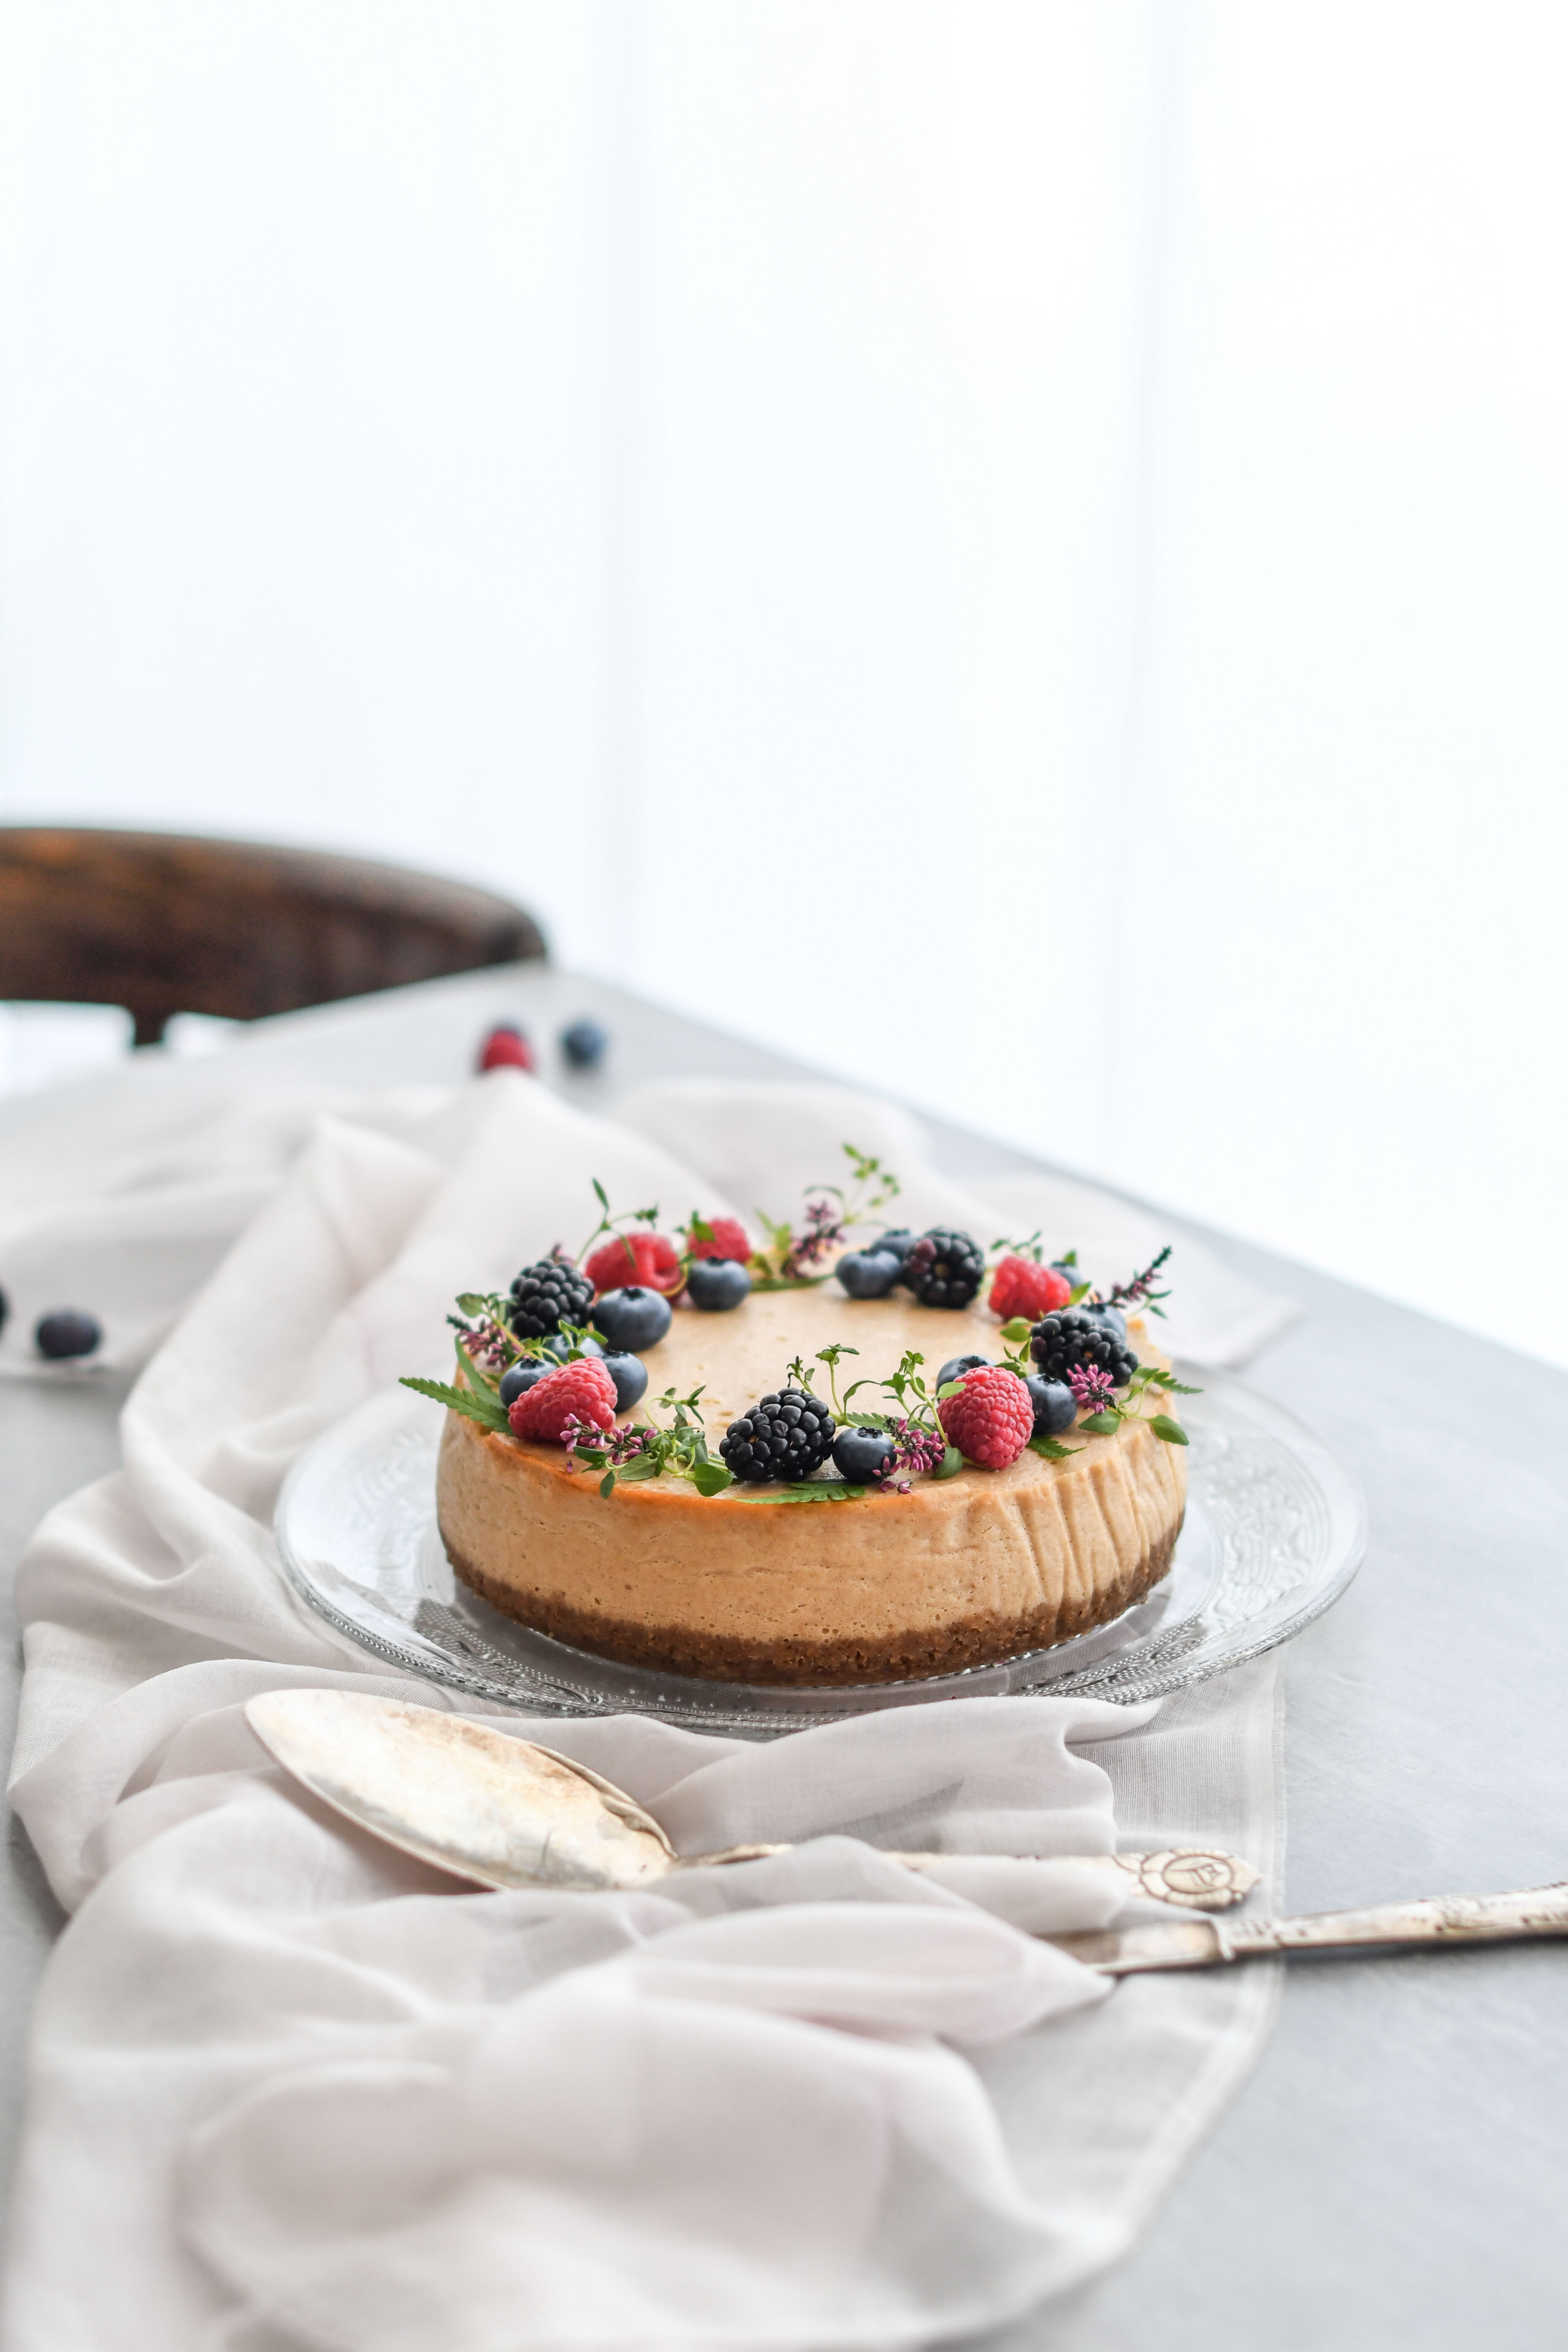 arasidovy cheesecake / peanutbutter cheesecake